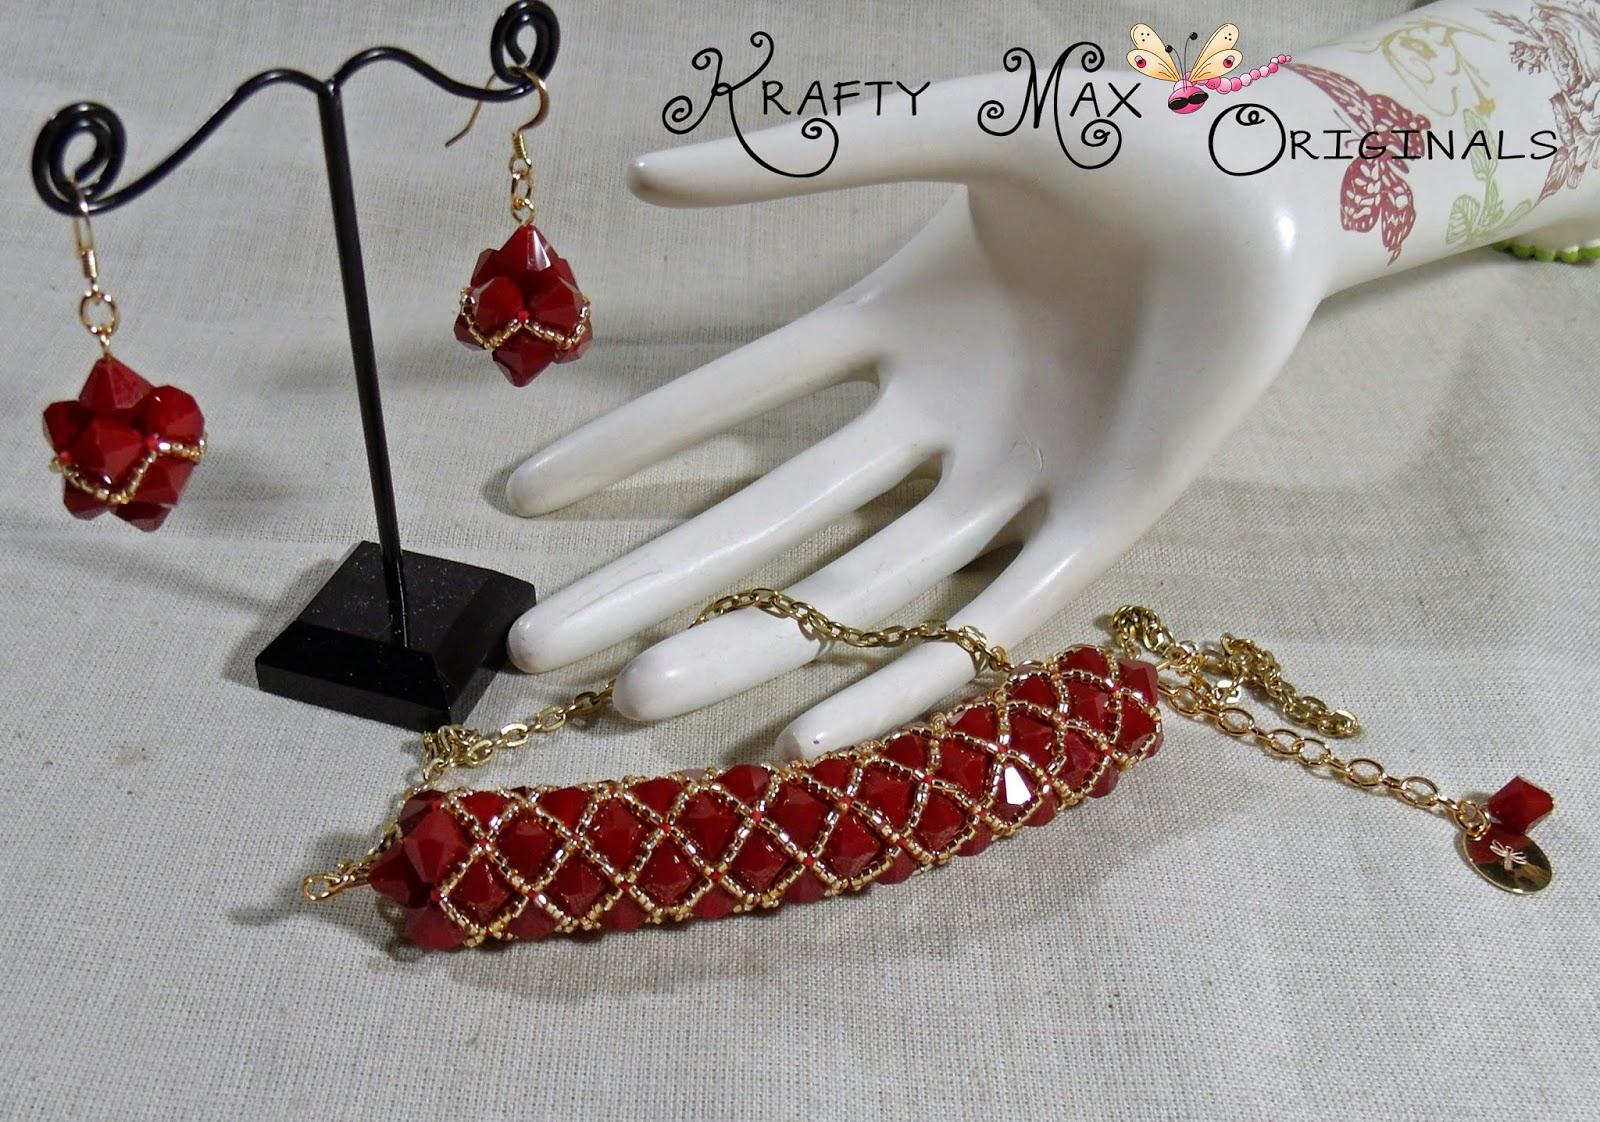 http://www.artfire.com/ext/shop/product_view/9198069